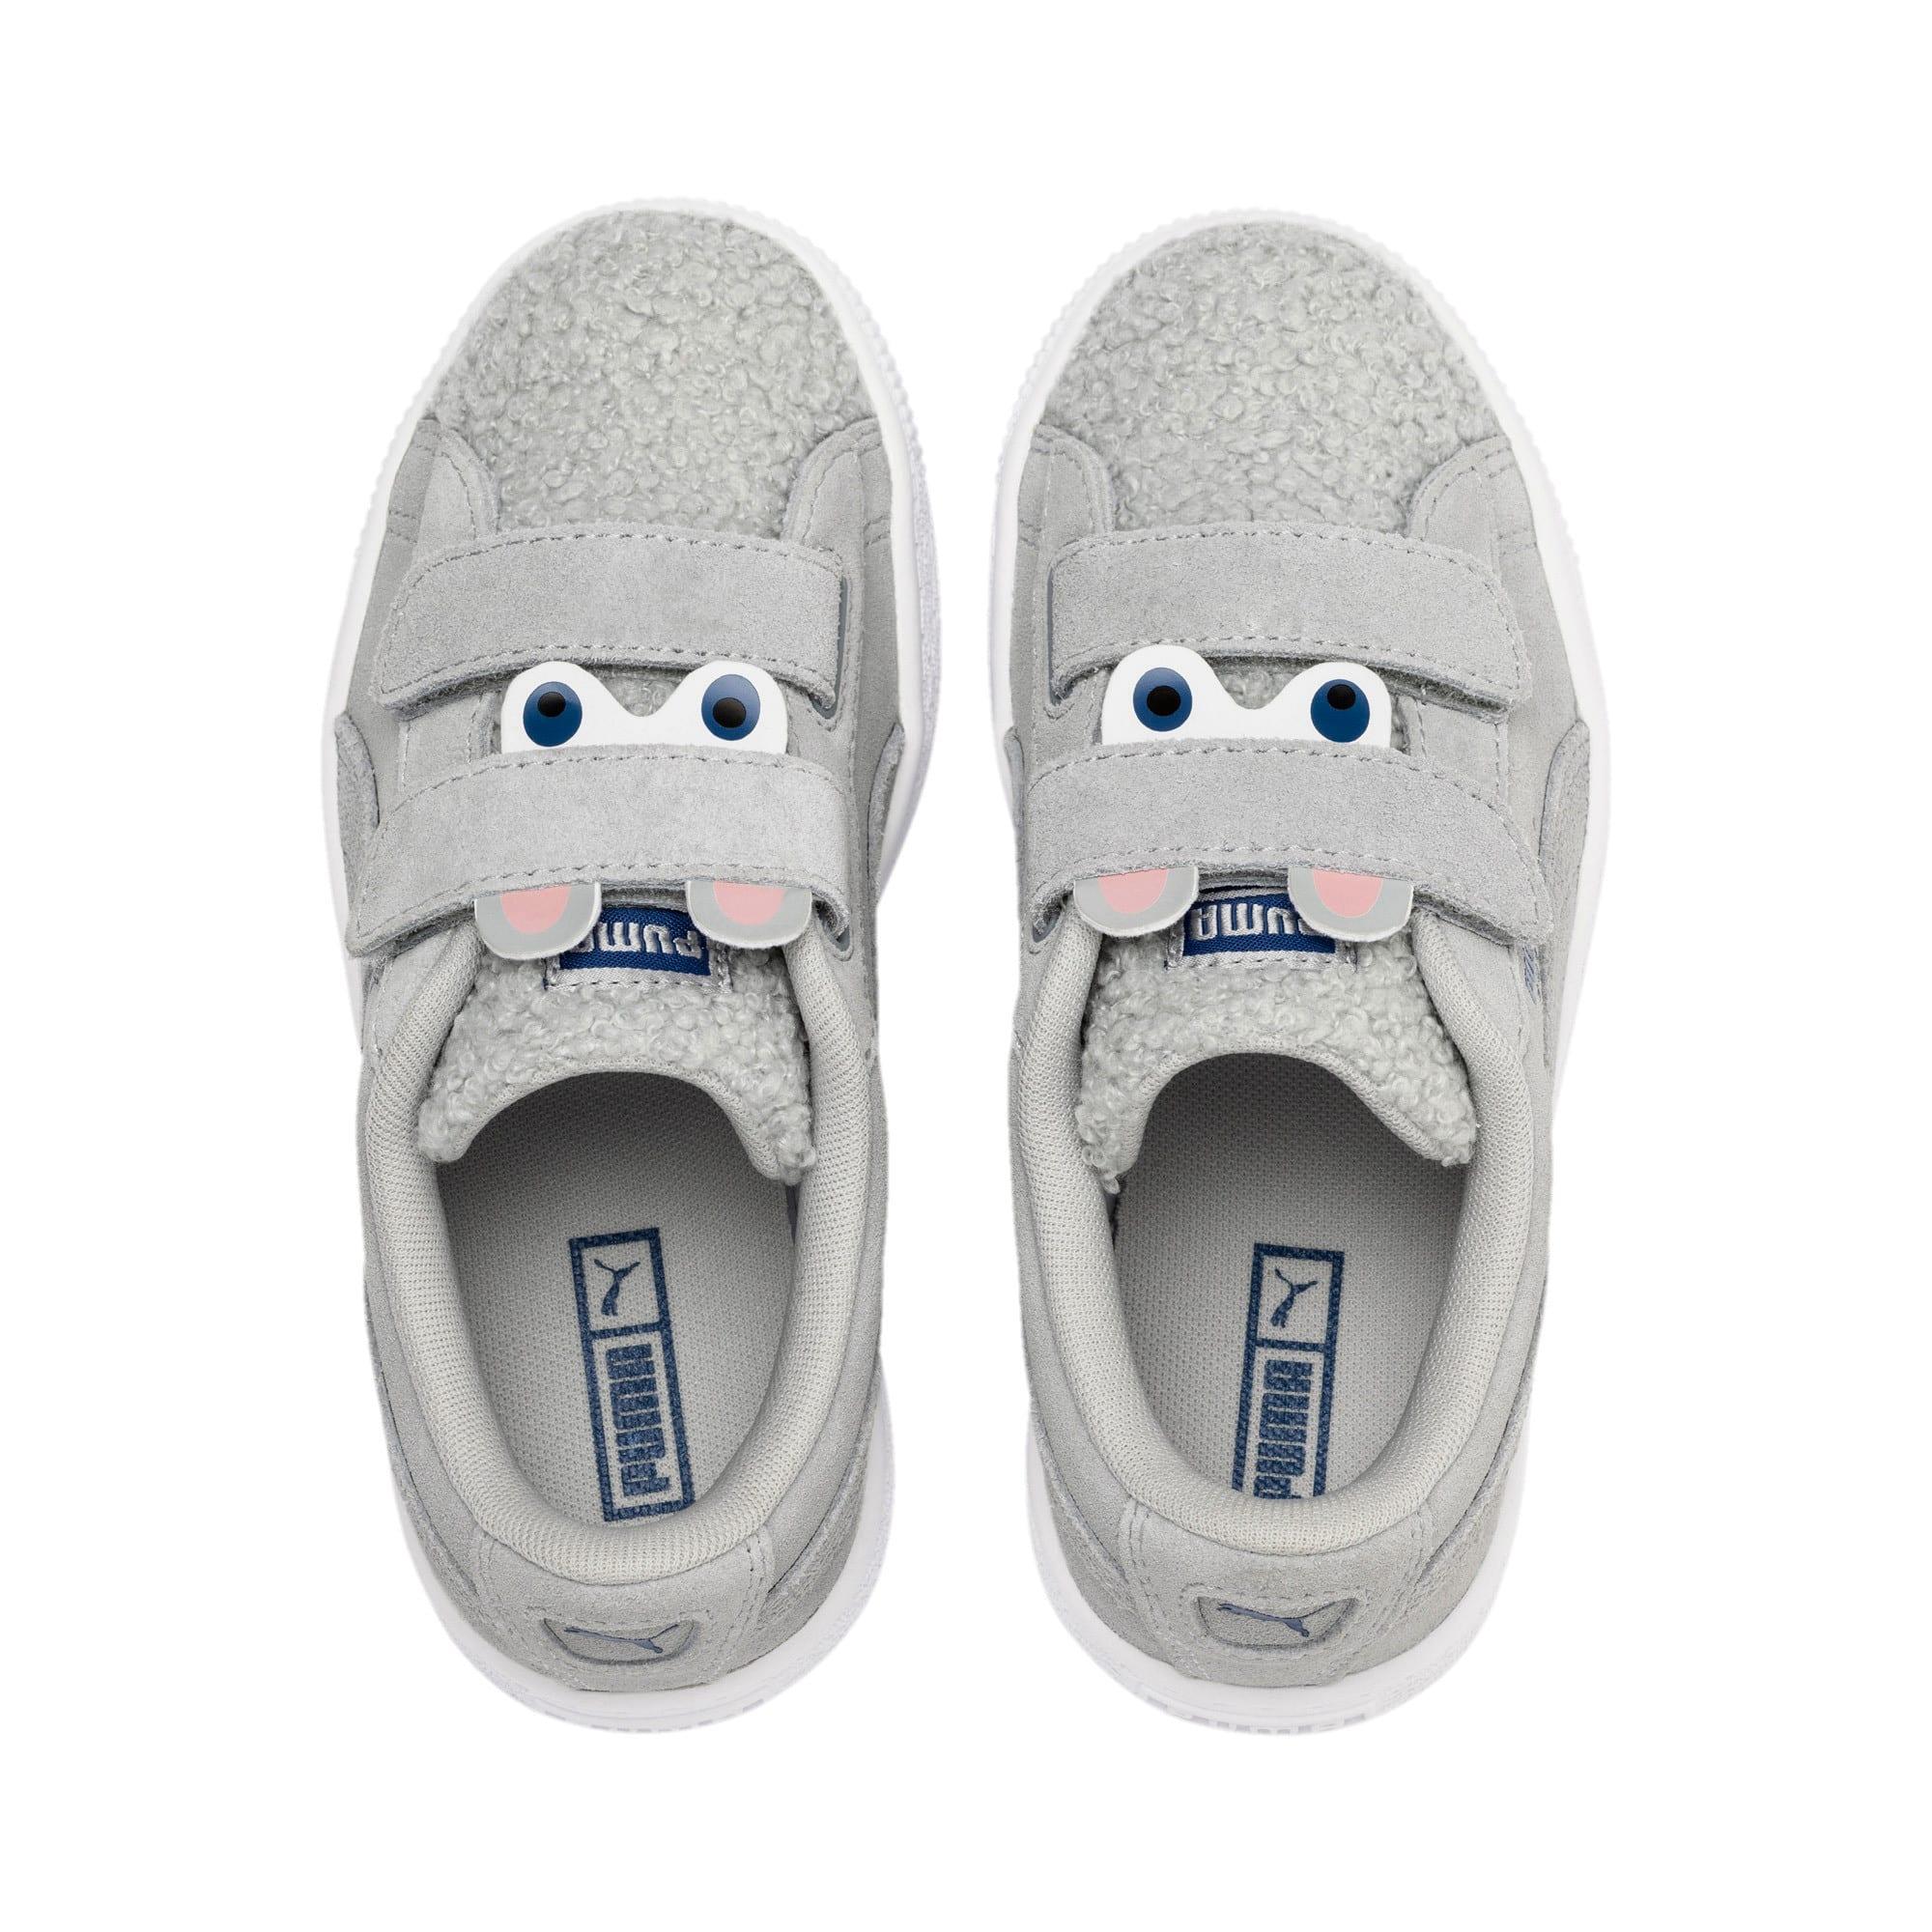 Thumbnail 6 of Suede Winter Monster Little Kids' Shoes, High Rise-Galaxy Blue, medium